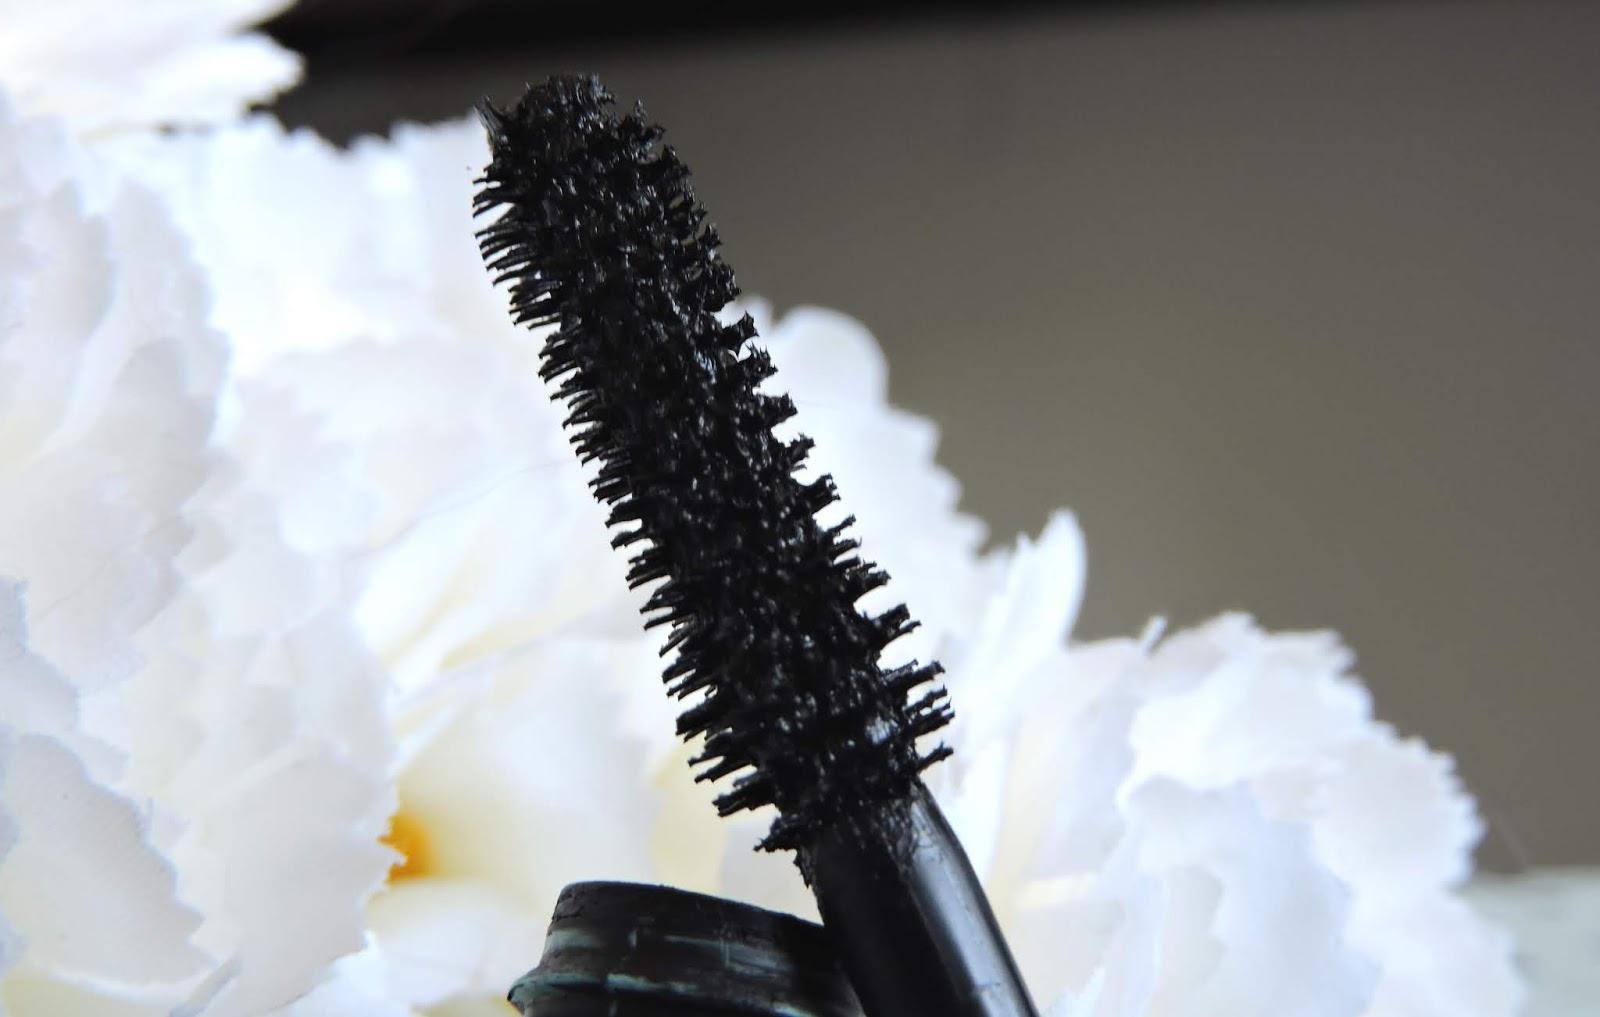 brosse mascara paradise extatic voluminous black waterproof l'oréal paris